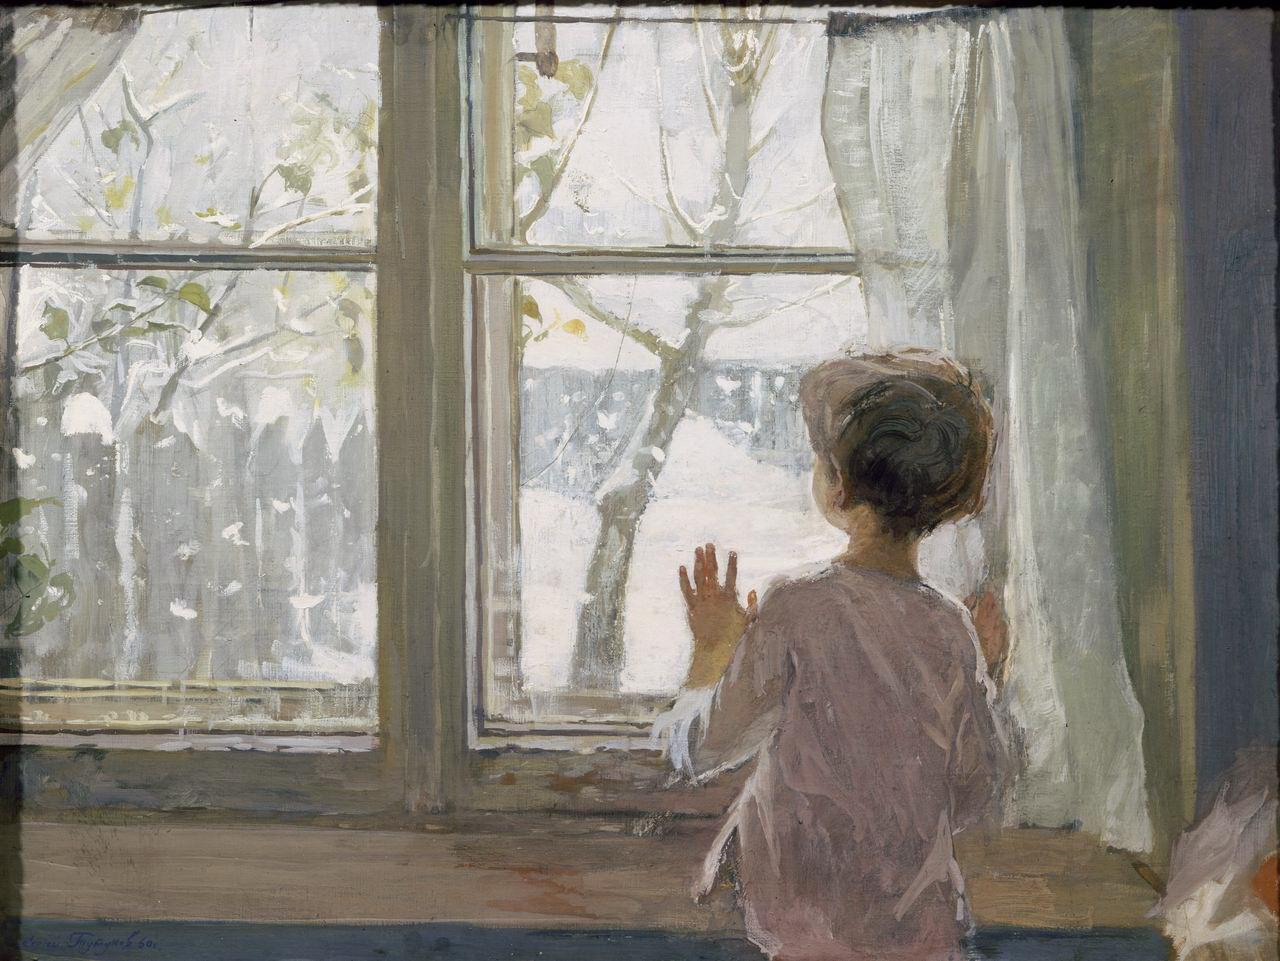 Сочинение миниaтюрa нa тему я смотрю в окно